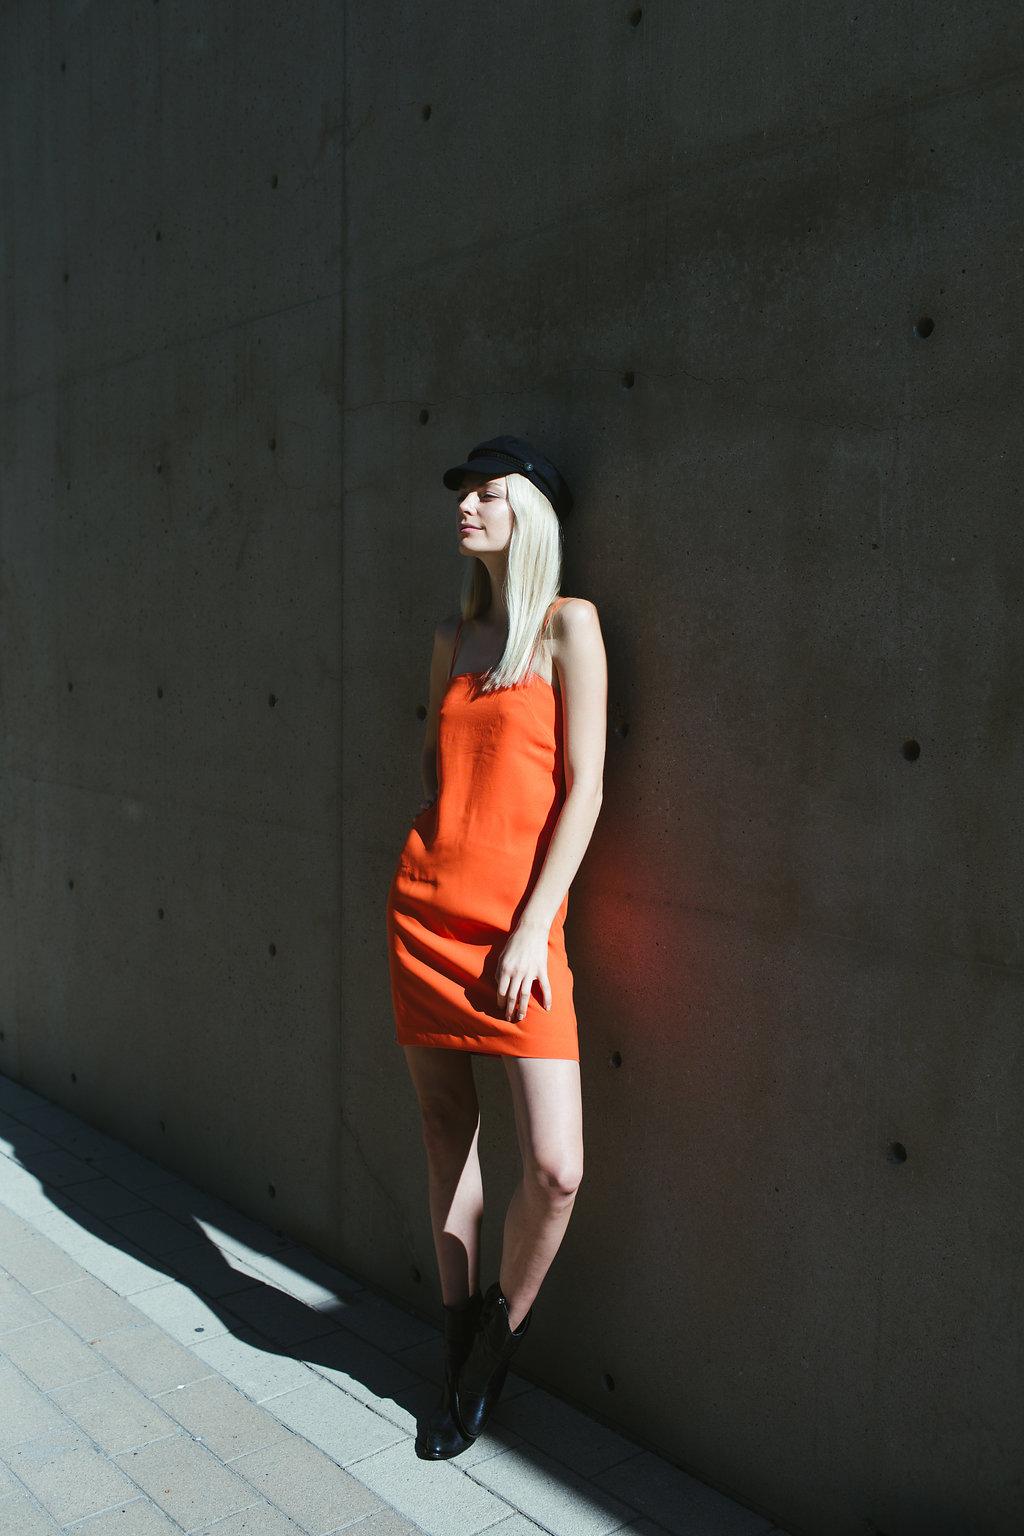 Paige-Newton-Austin-Model-Fashion-Photography0015.jpg